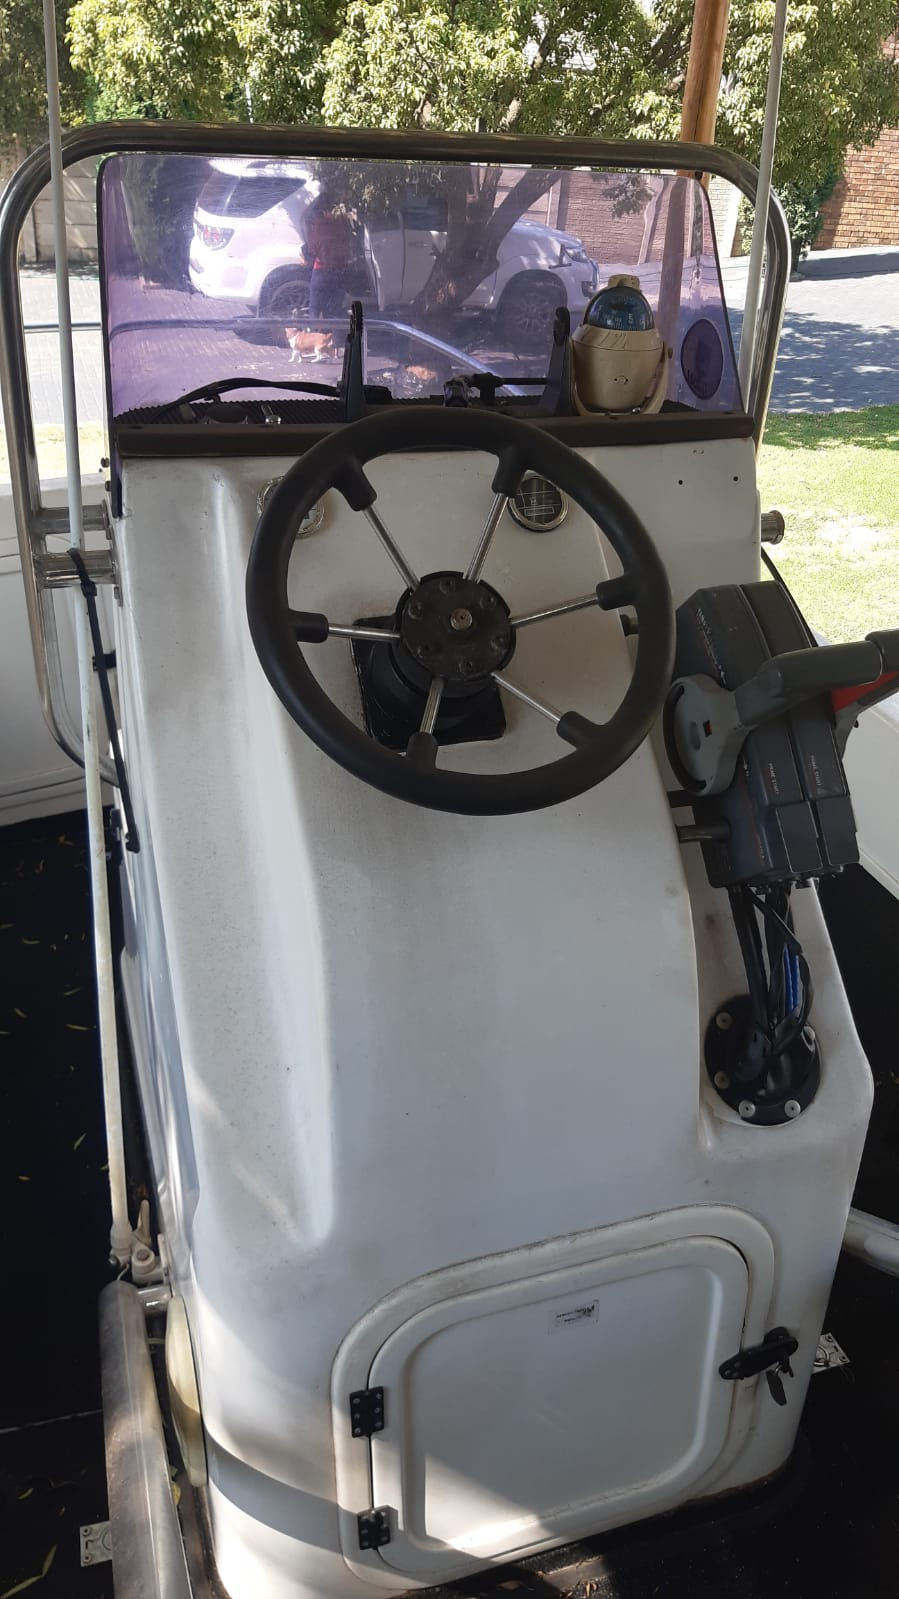 kozi cat 16 center console 2x50hp Yamaha  hydraulic steering no trim and tilt